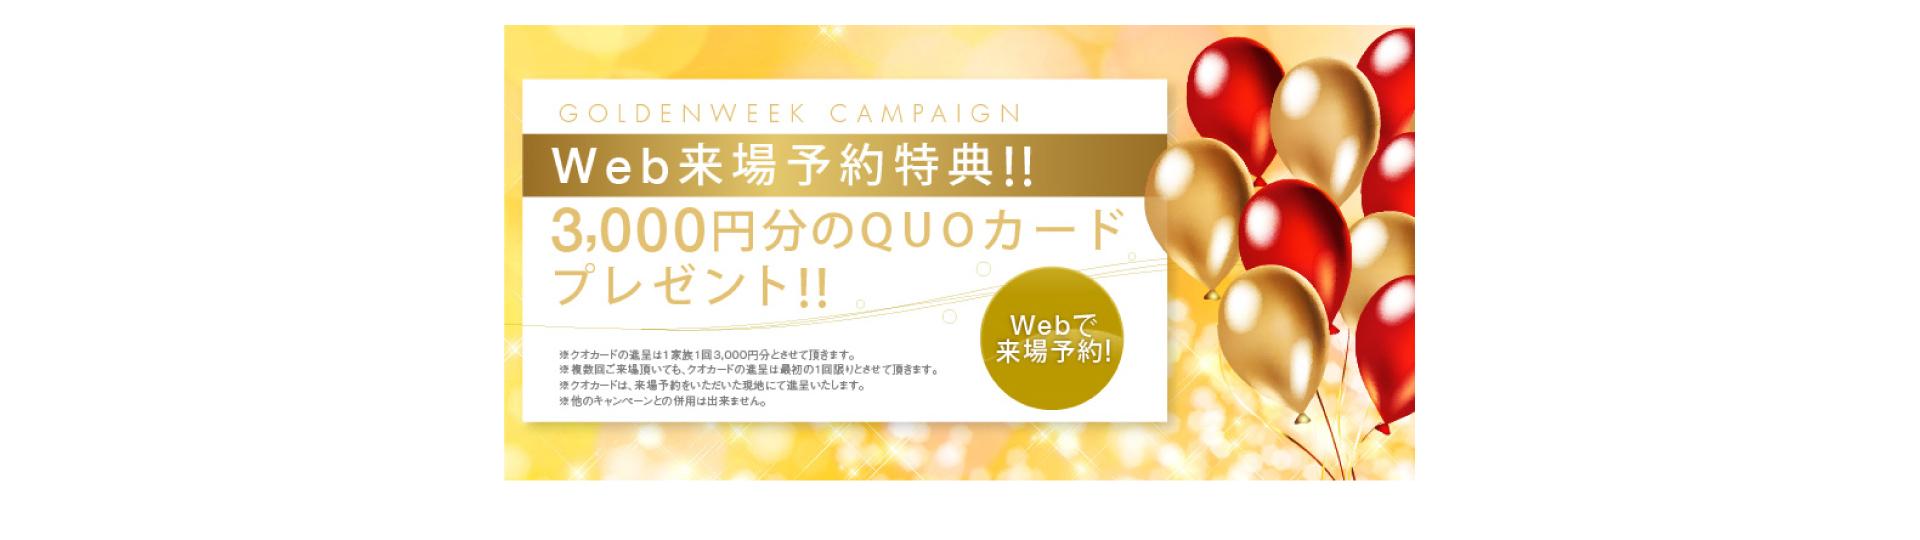 GoldenWeek Campaign